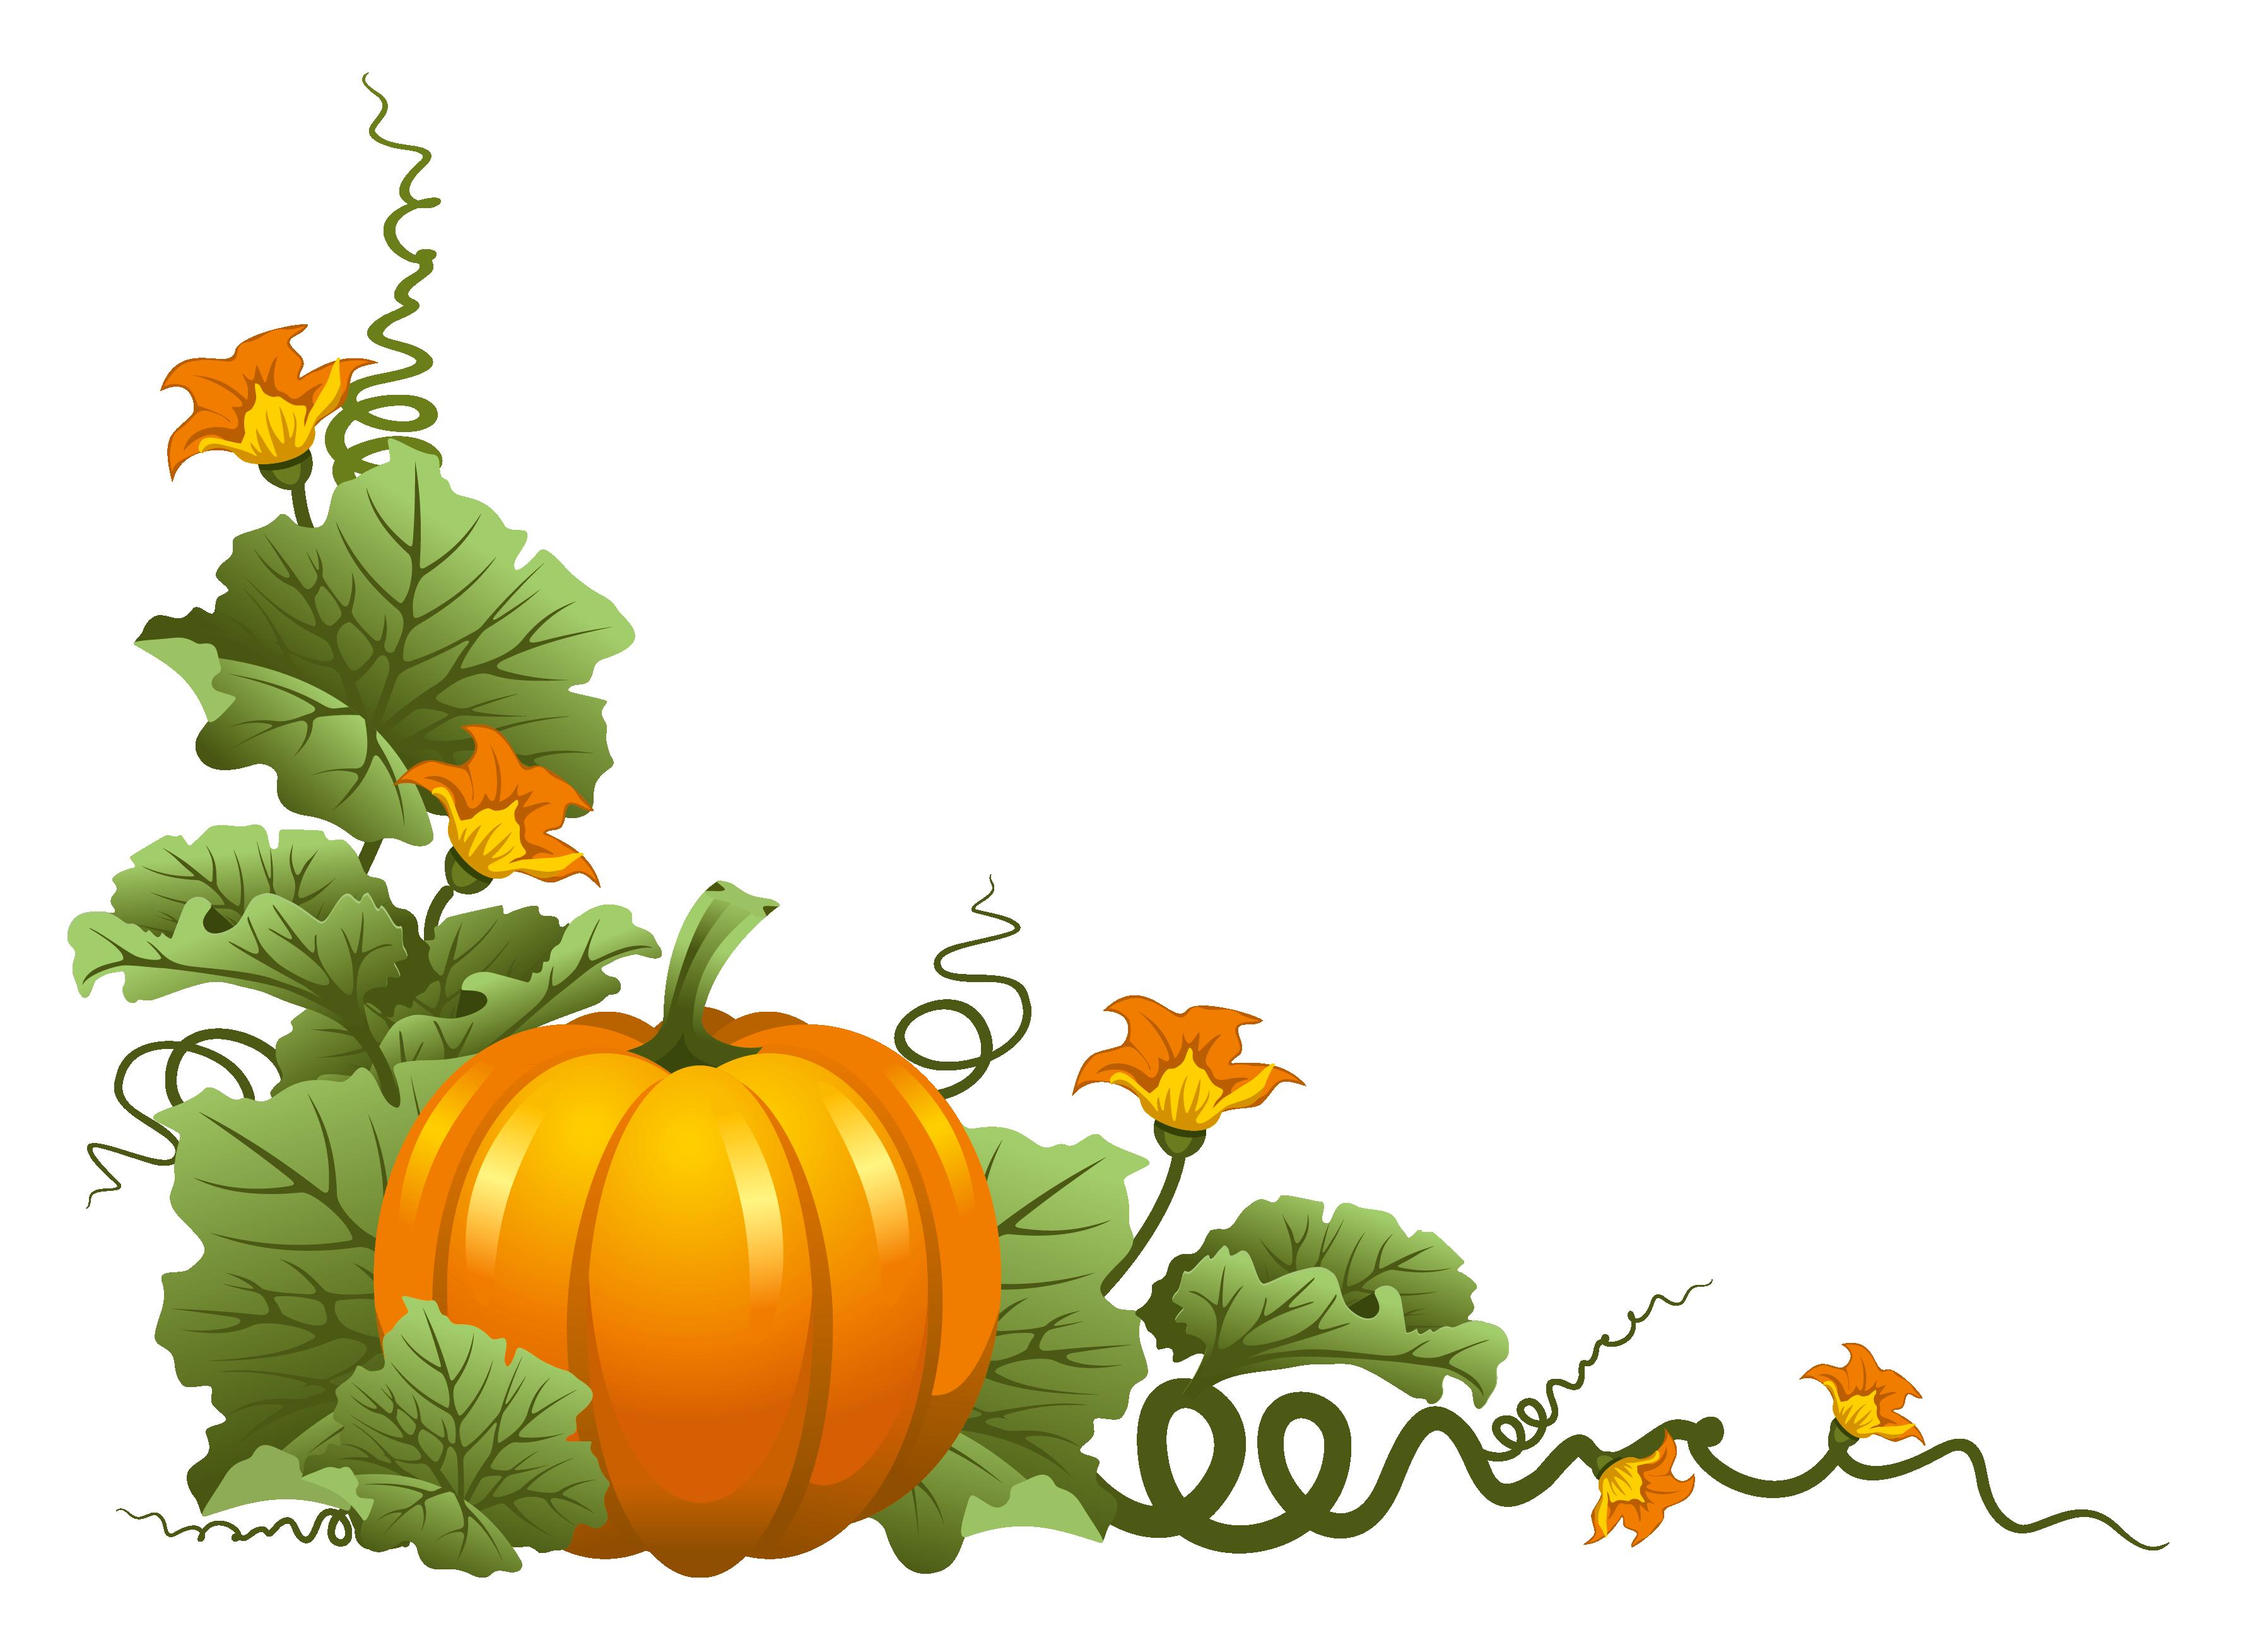 Clipart thanksgiving transparent background. Pumpkin clip art decor